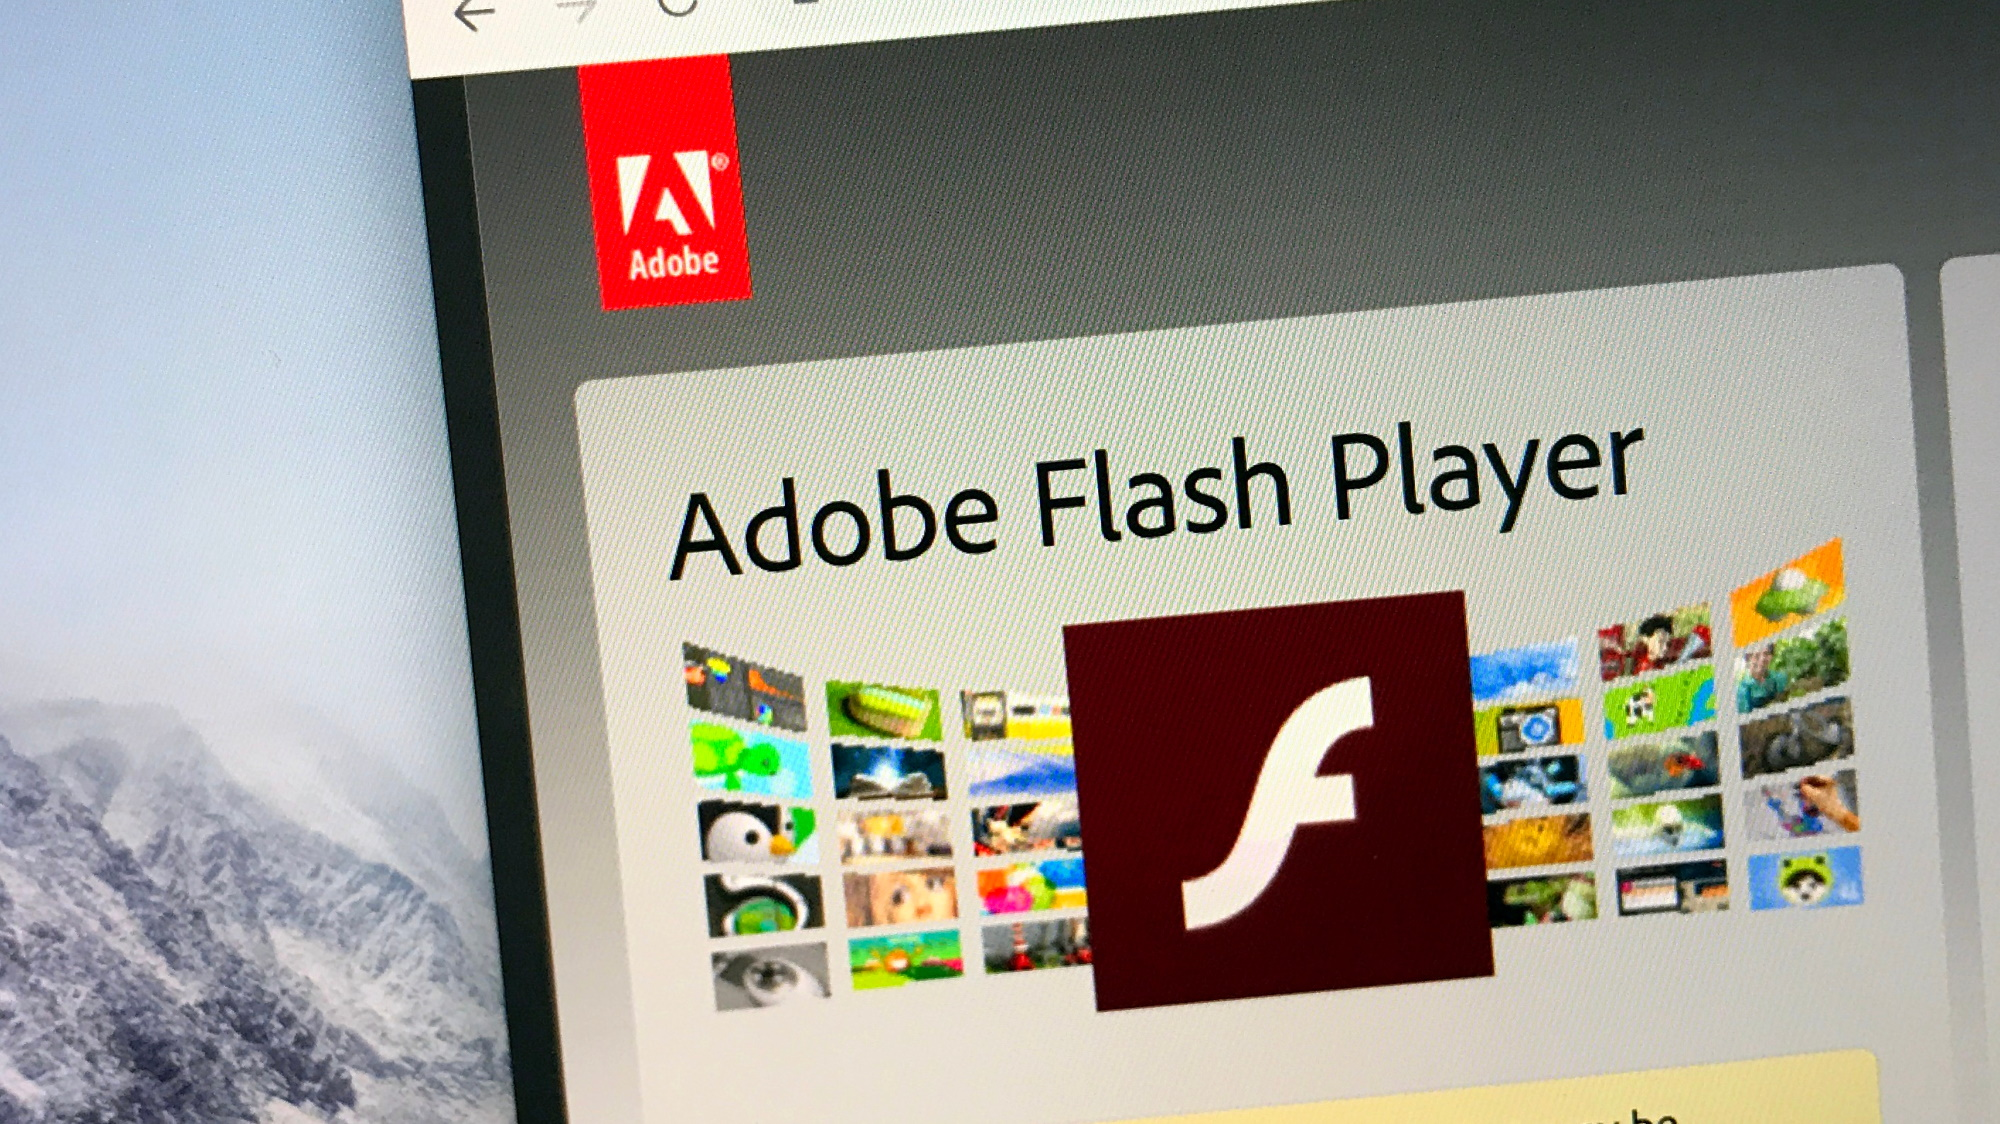 Adobe flash player apple macbook air download pc